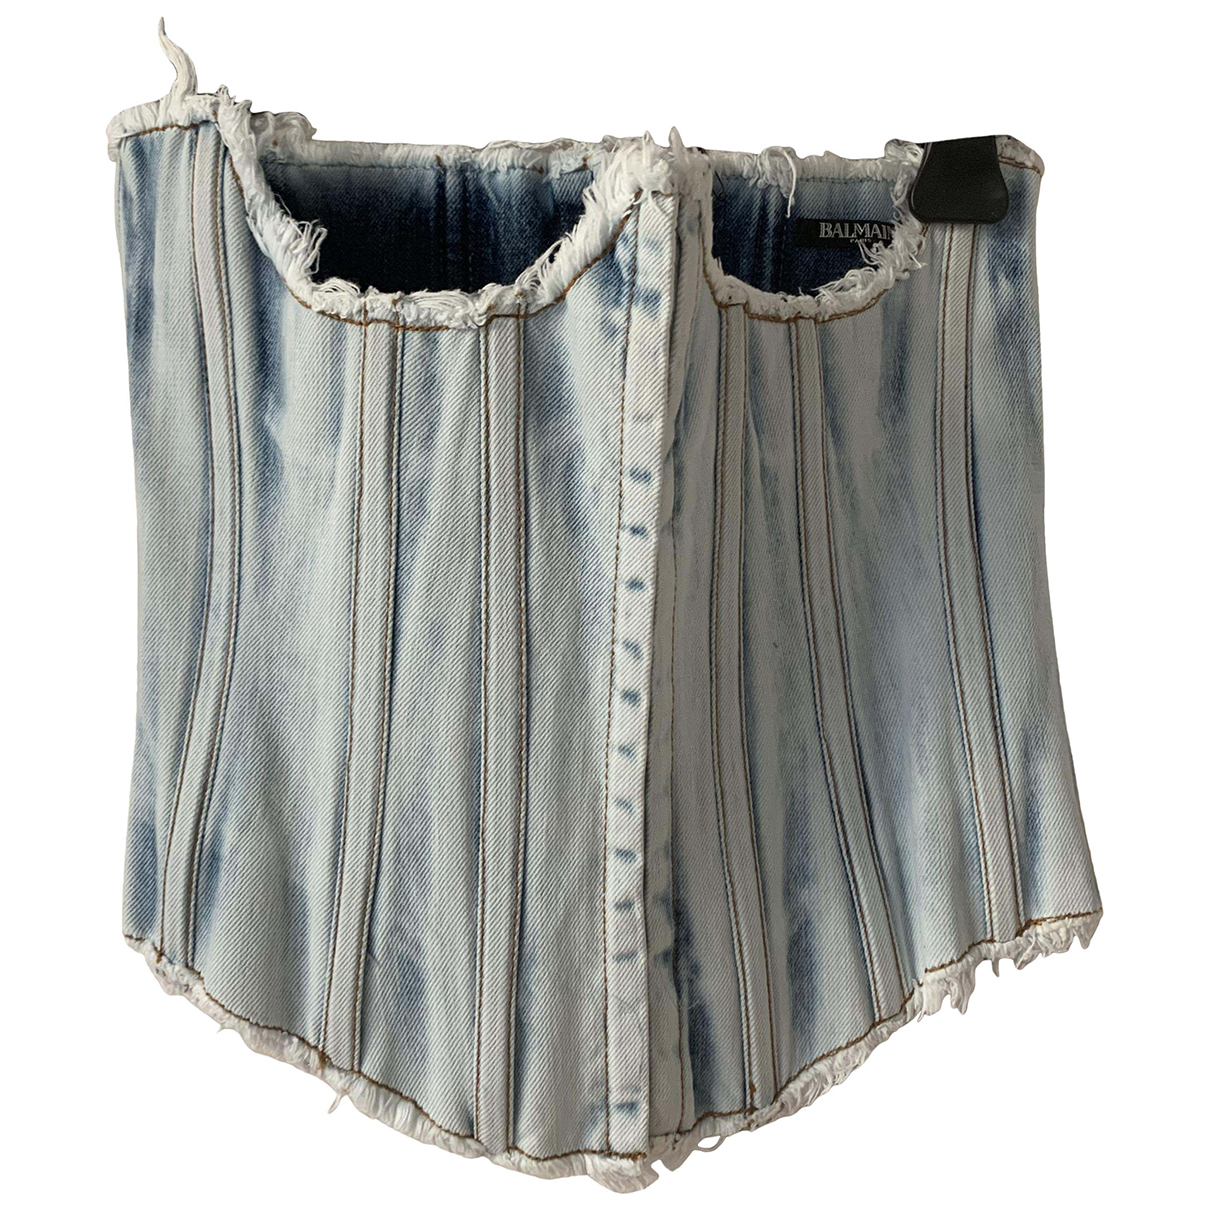 Balmain N Blue Denim - Jeans  top for Women 38 FR